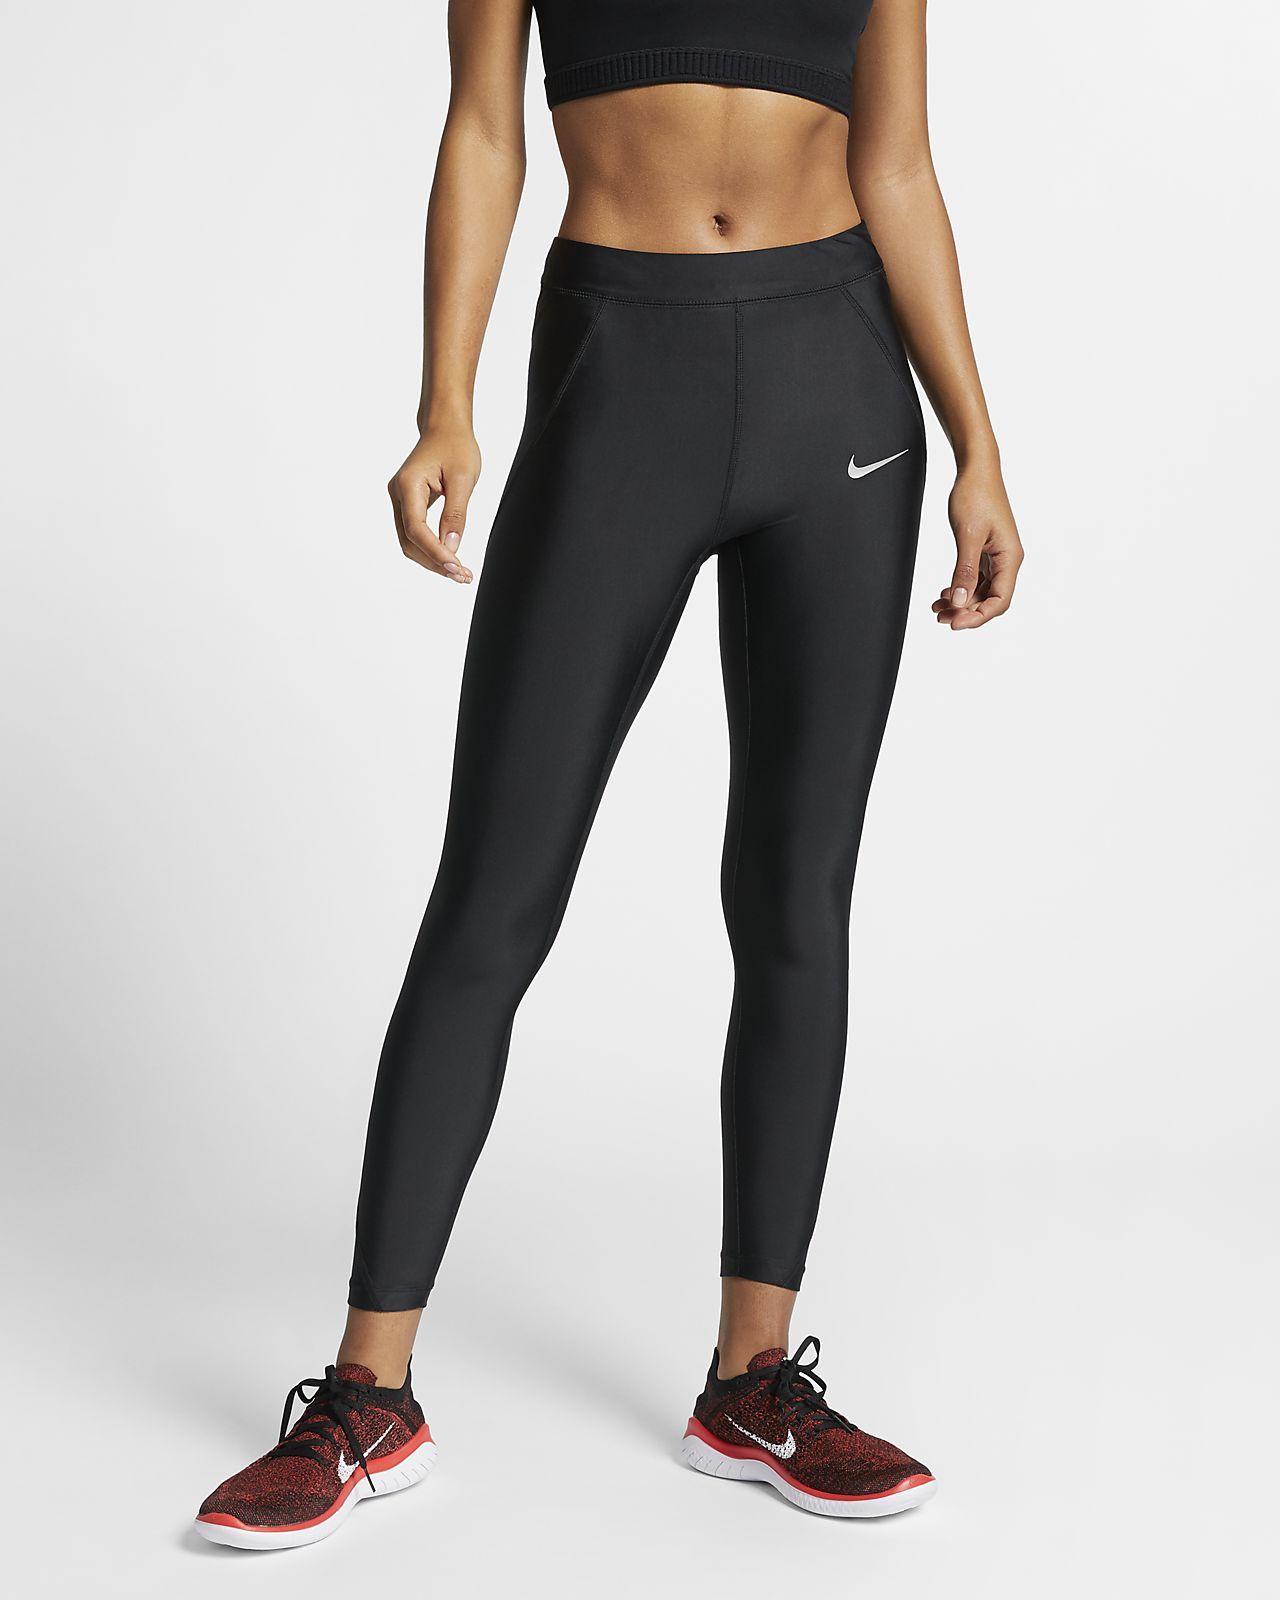 Nike Speed 7/8-tights voor dames